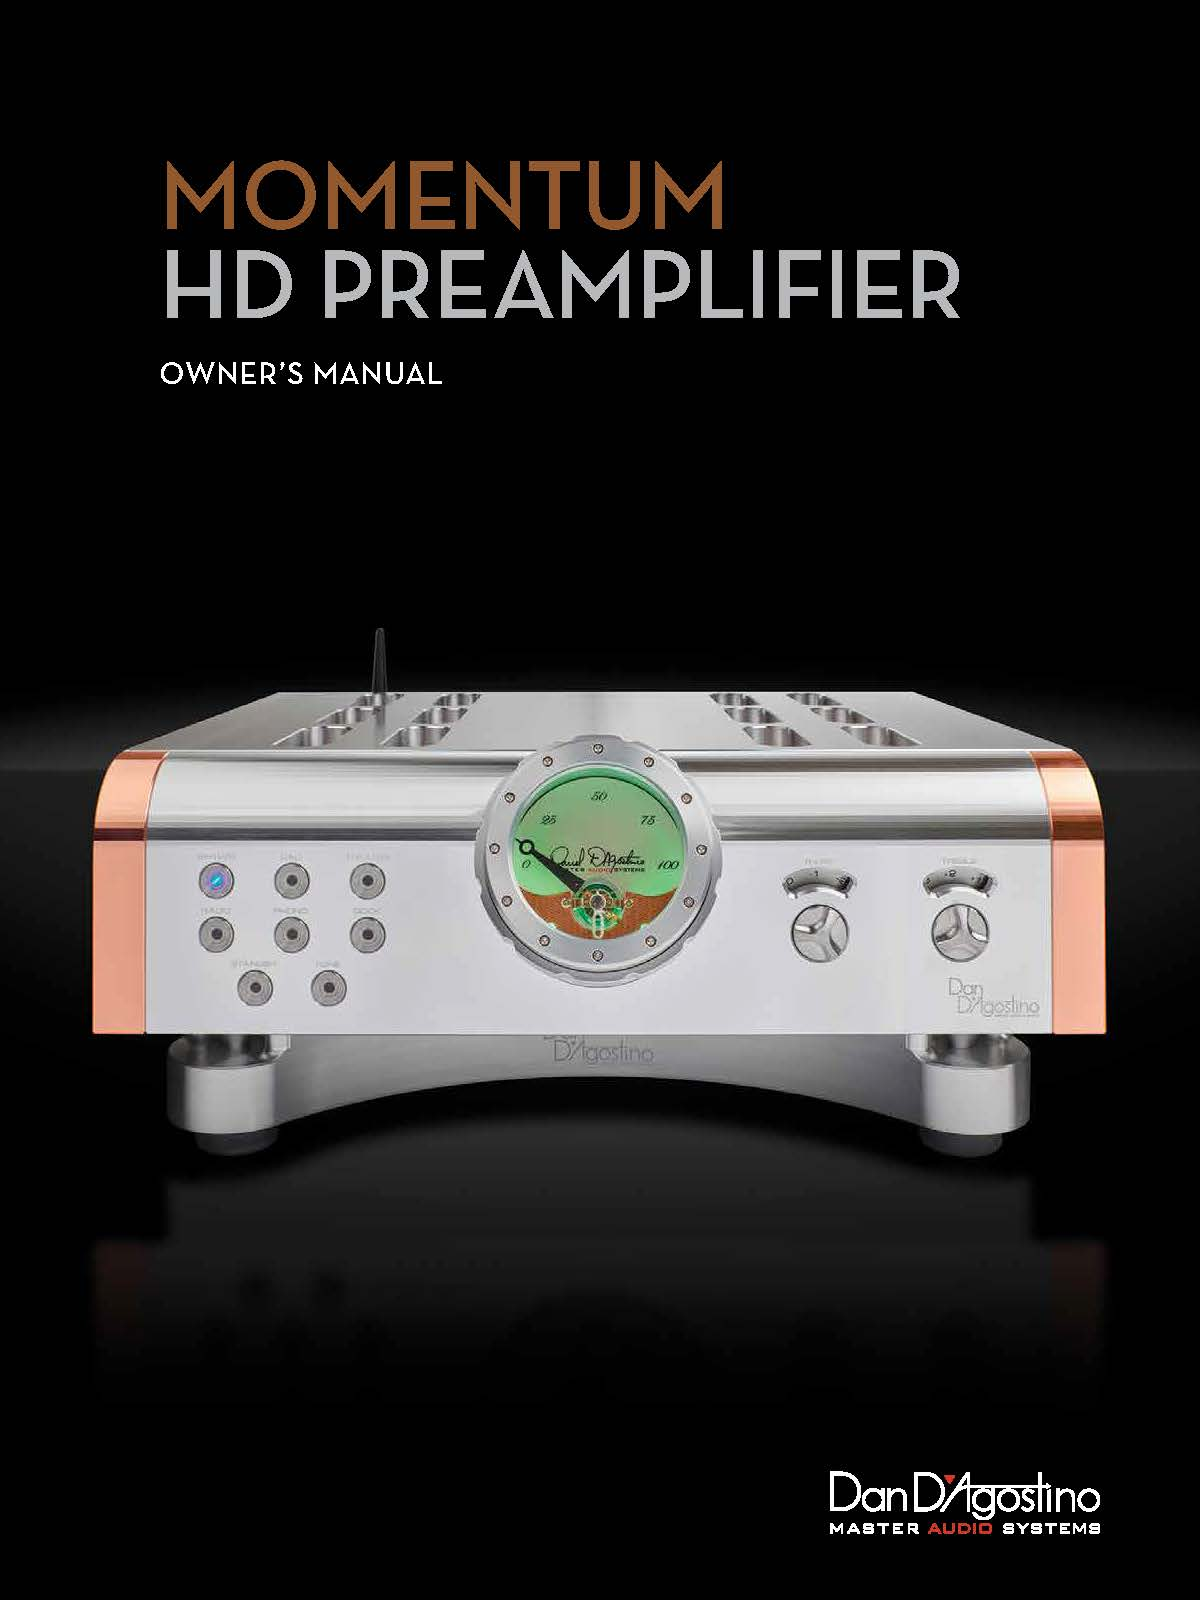 Dan D'Agostino Momentum HD Preamplifier Owner Manual - Norman Audio